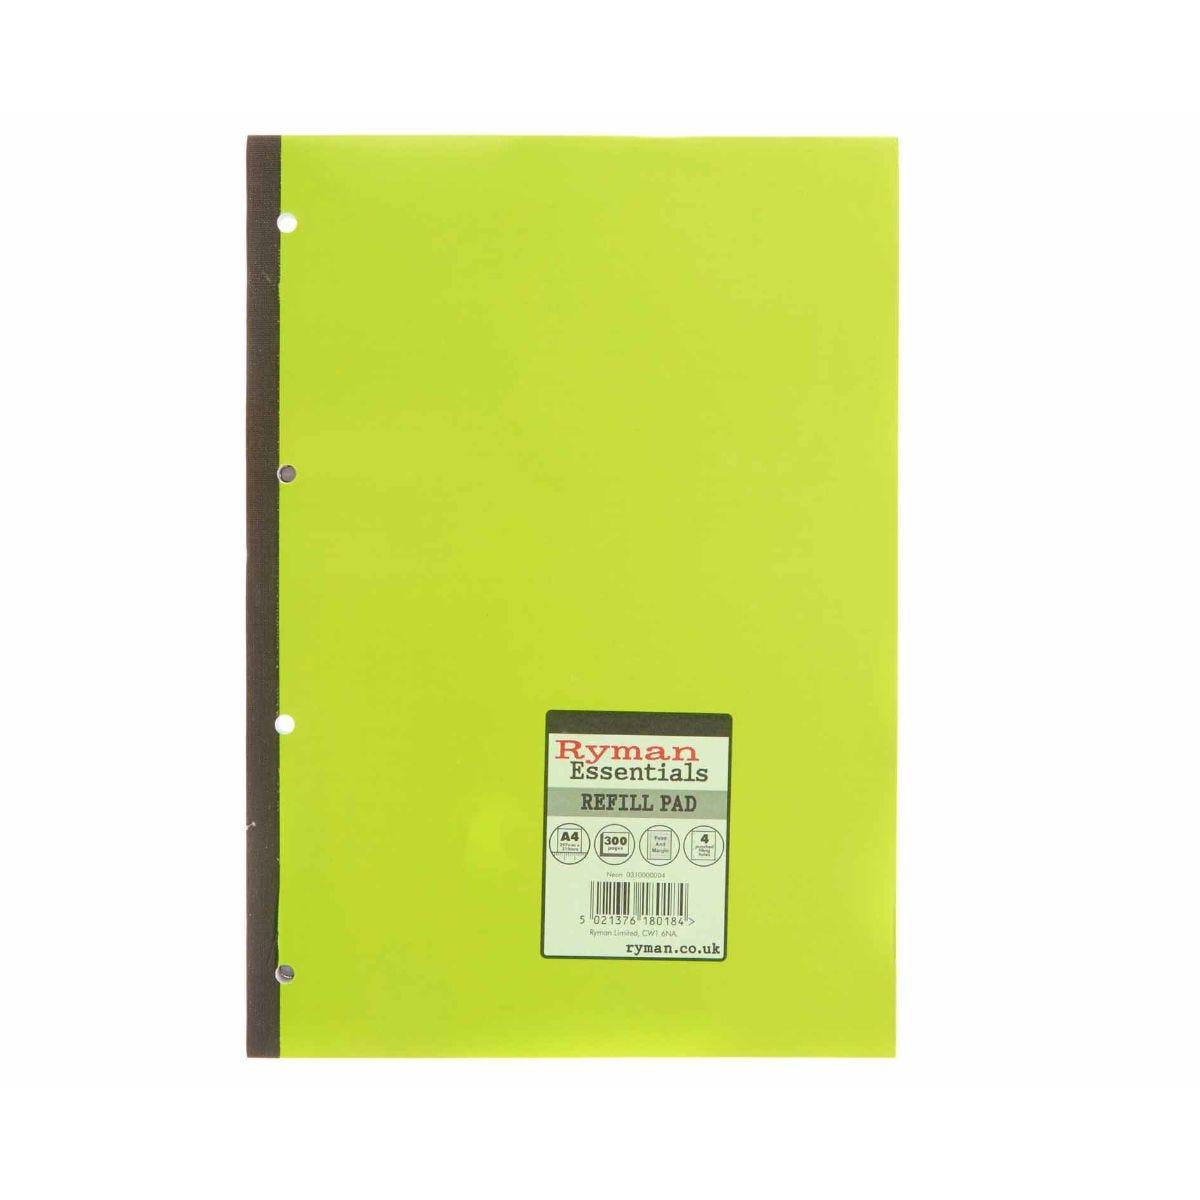 Refill Pads | A4 Refill Pads & More | Ryman® UK